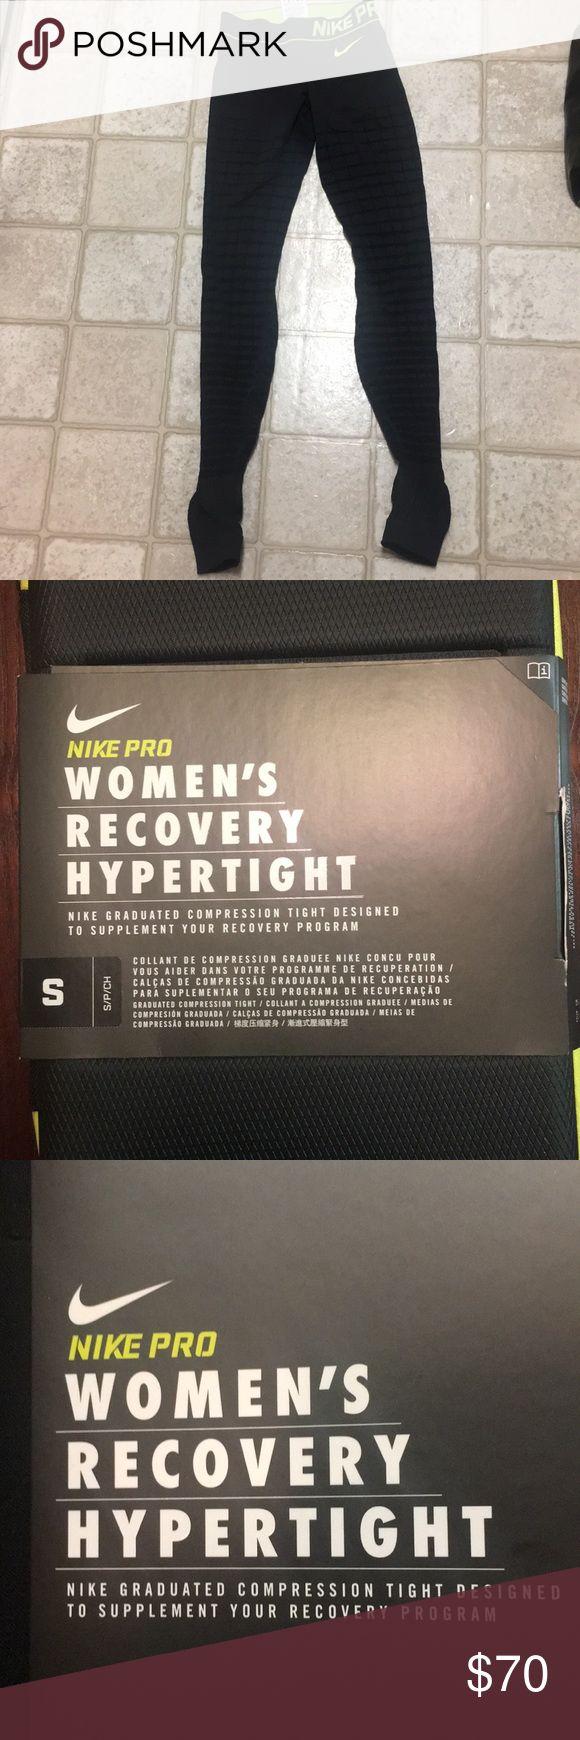 Nike Pro Women's Recovery Hypertight Leggings Women's size small Brand new  Case included Nike Pants Leggings